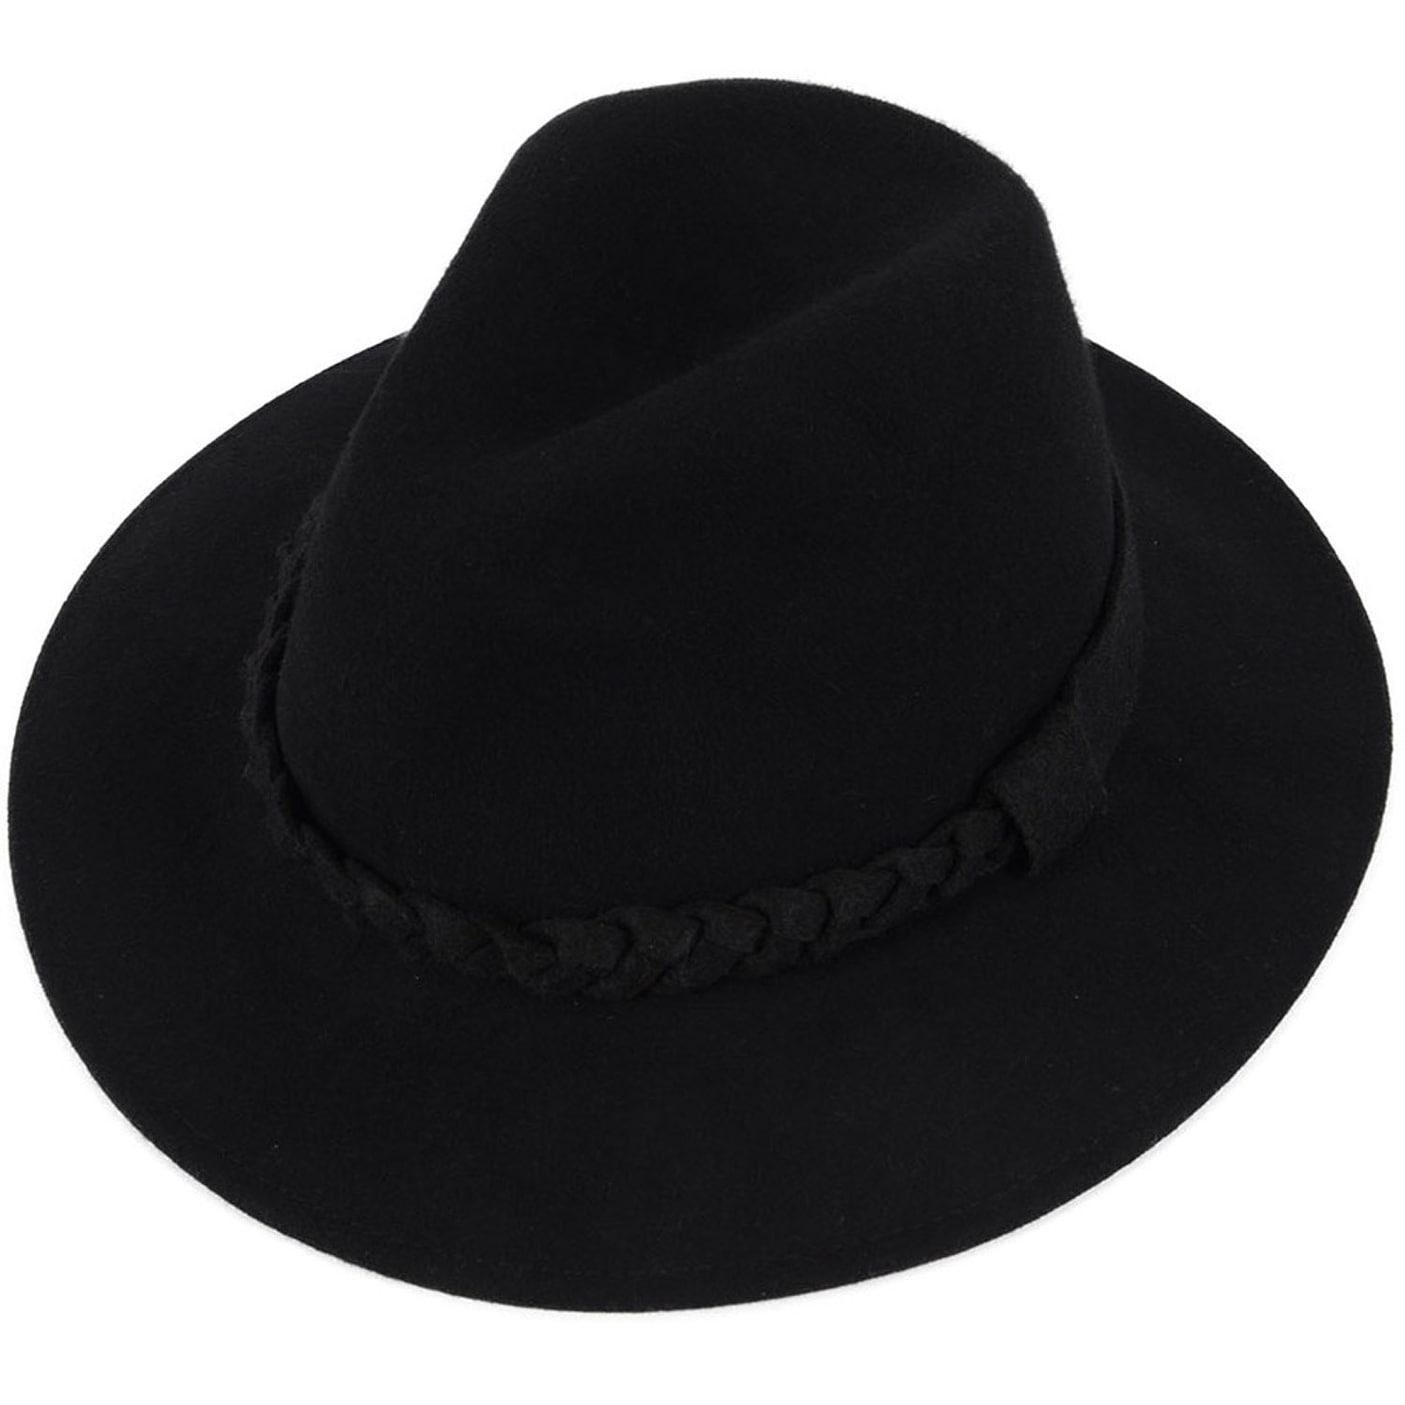 a67197e2565450 Shop Women's Wide Brim Wool Felt Fedora Hat with Braided Band ...